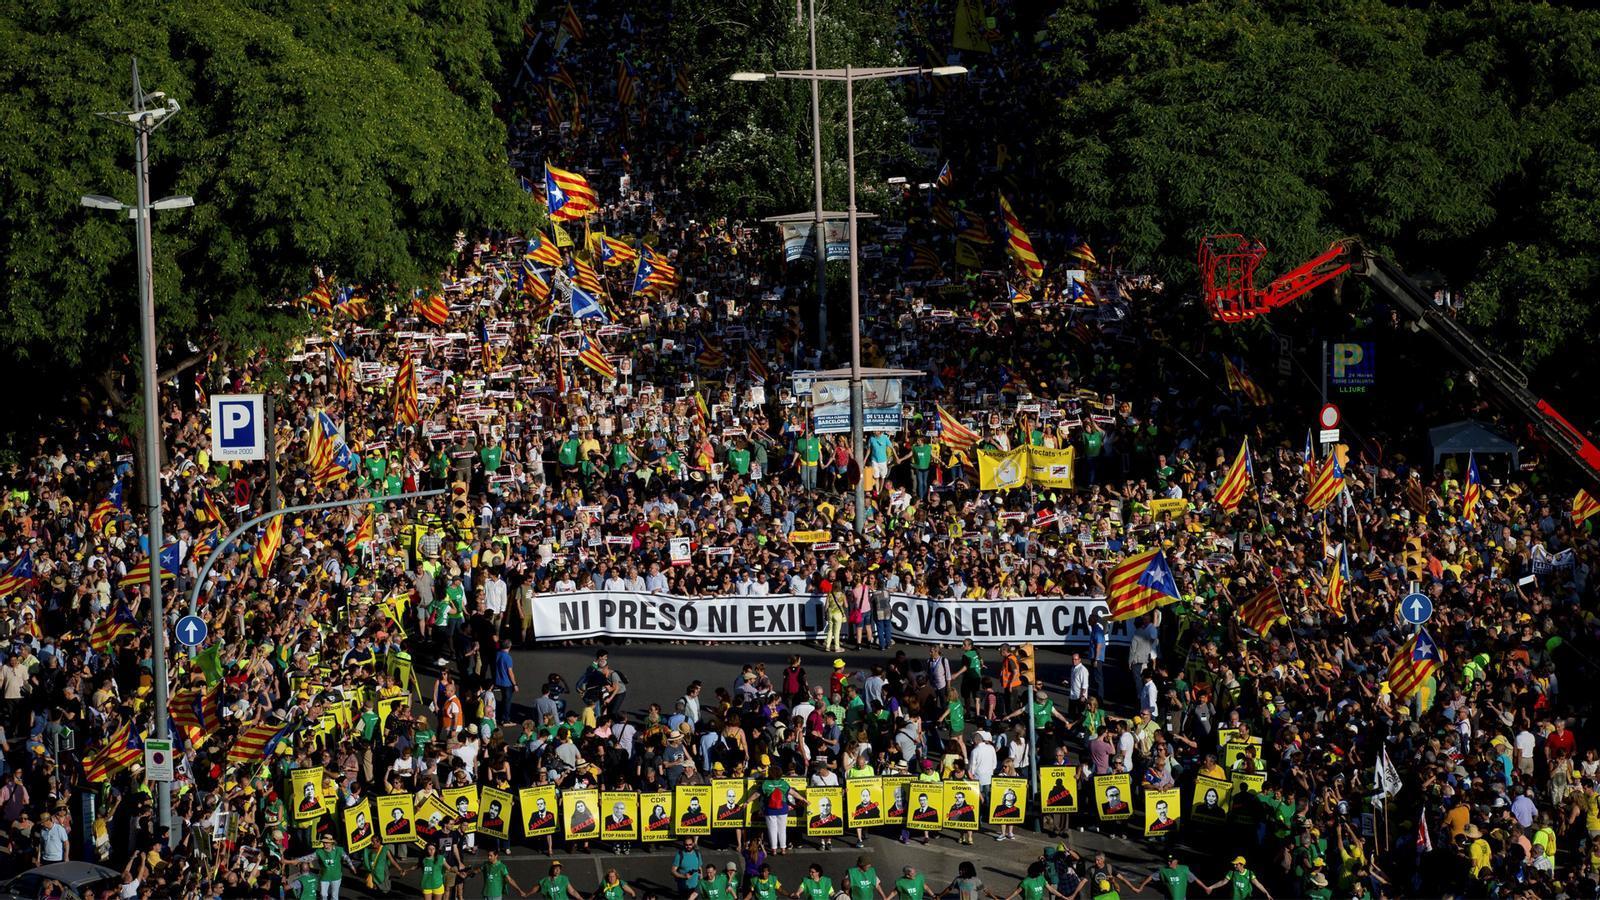 L'anàlisi d'Antoni Bassas: 'Puigdemont, Borrell, Arrimadas i l'hegemonia de l'independentisme'